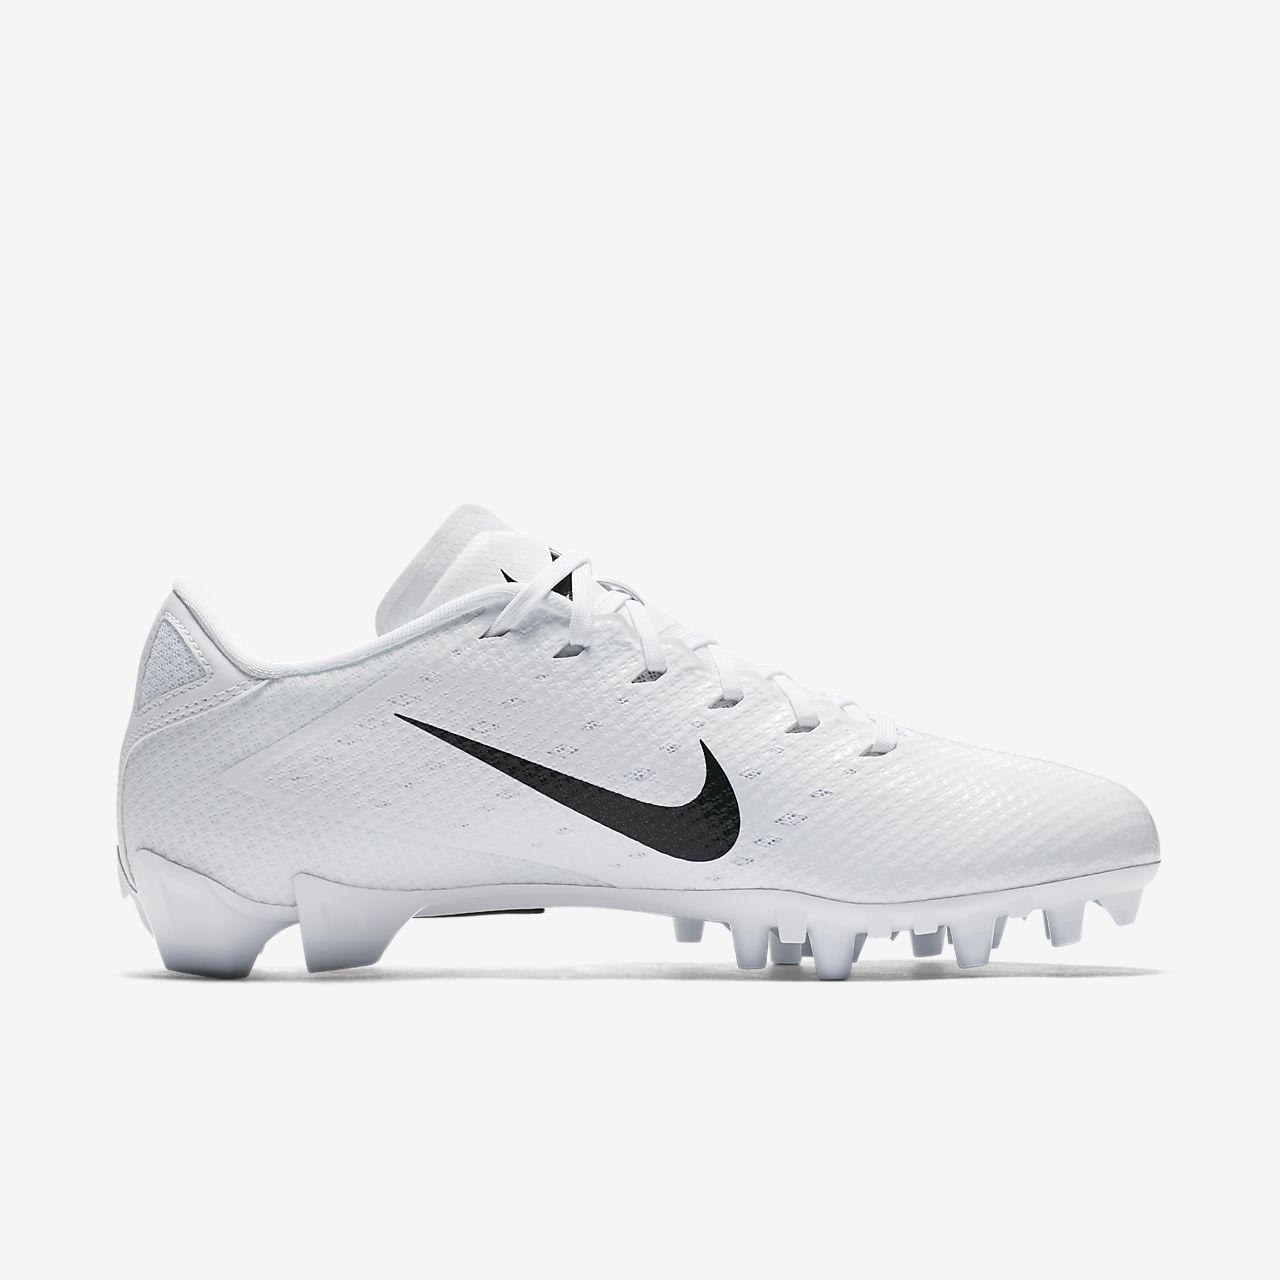 ... Nike Vapor Untouchable 3 Speed Men's Football Cleat